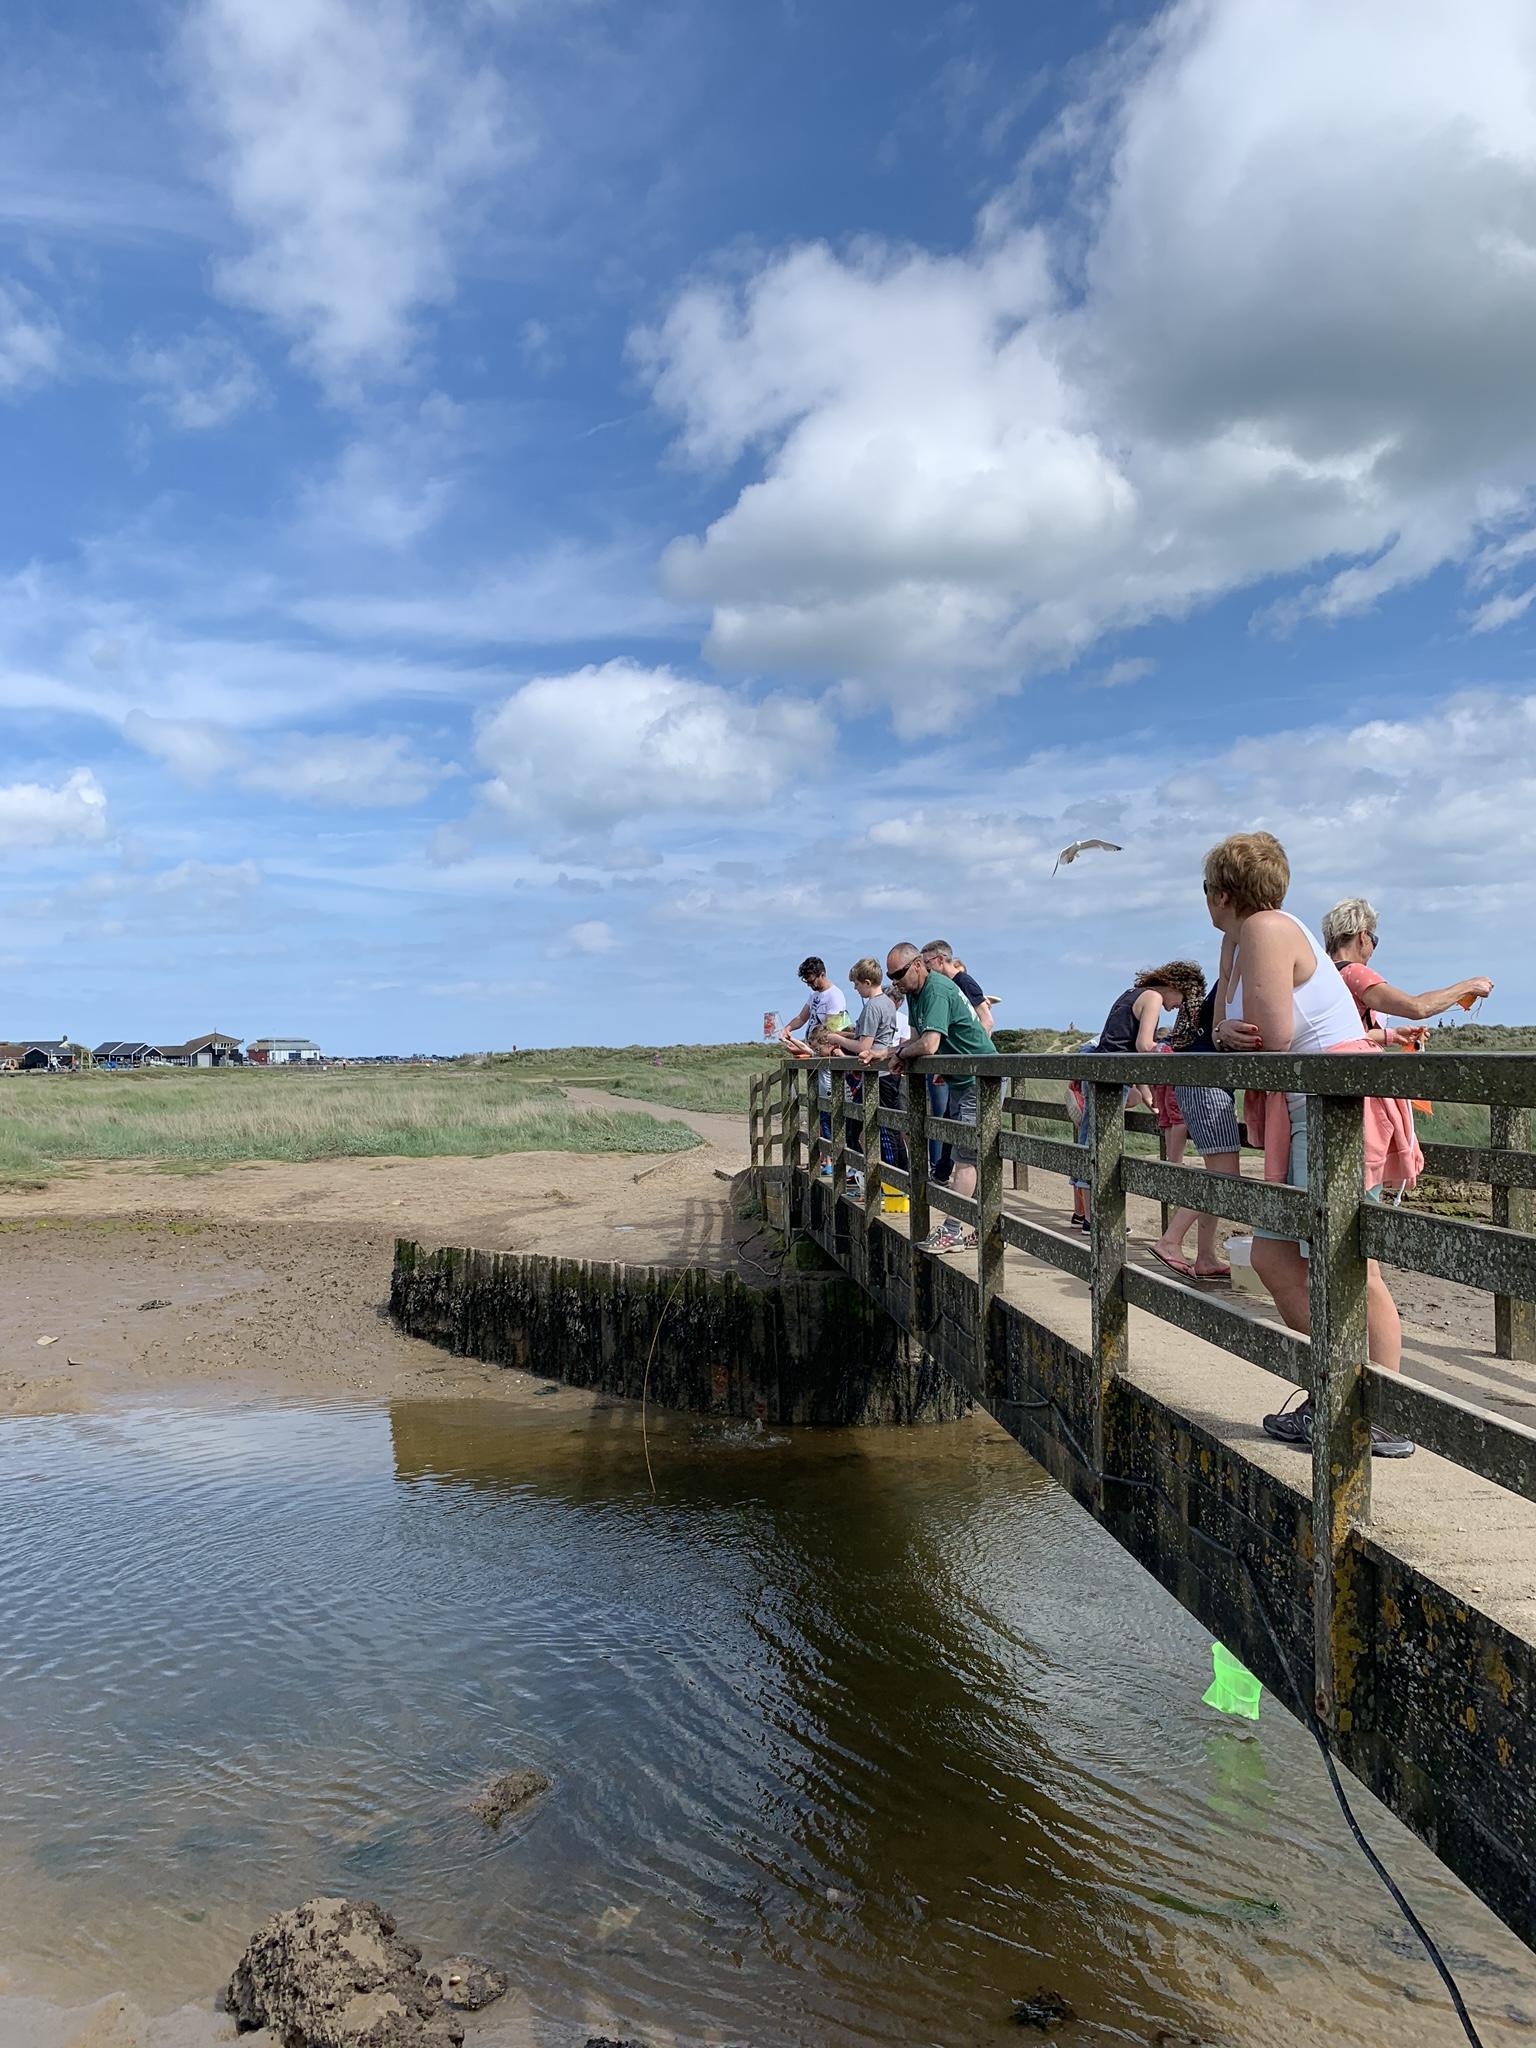 30 Days Wild day 2: Crabbing in Walberswick - The Smaller Explorer